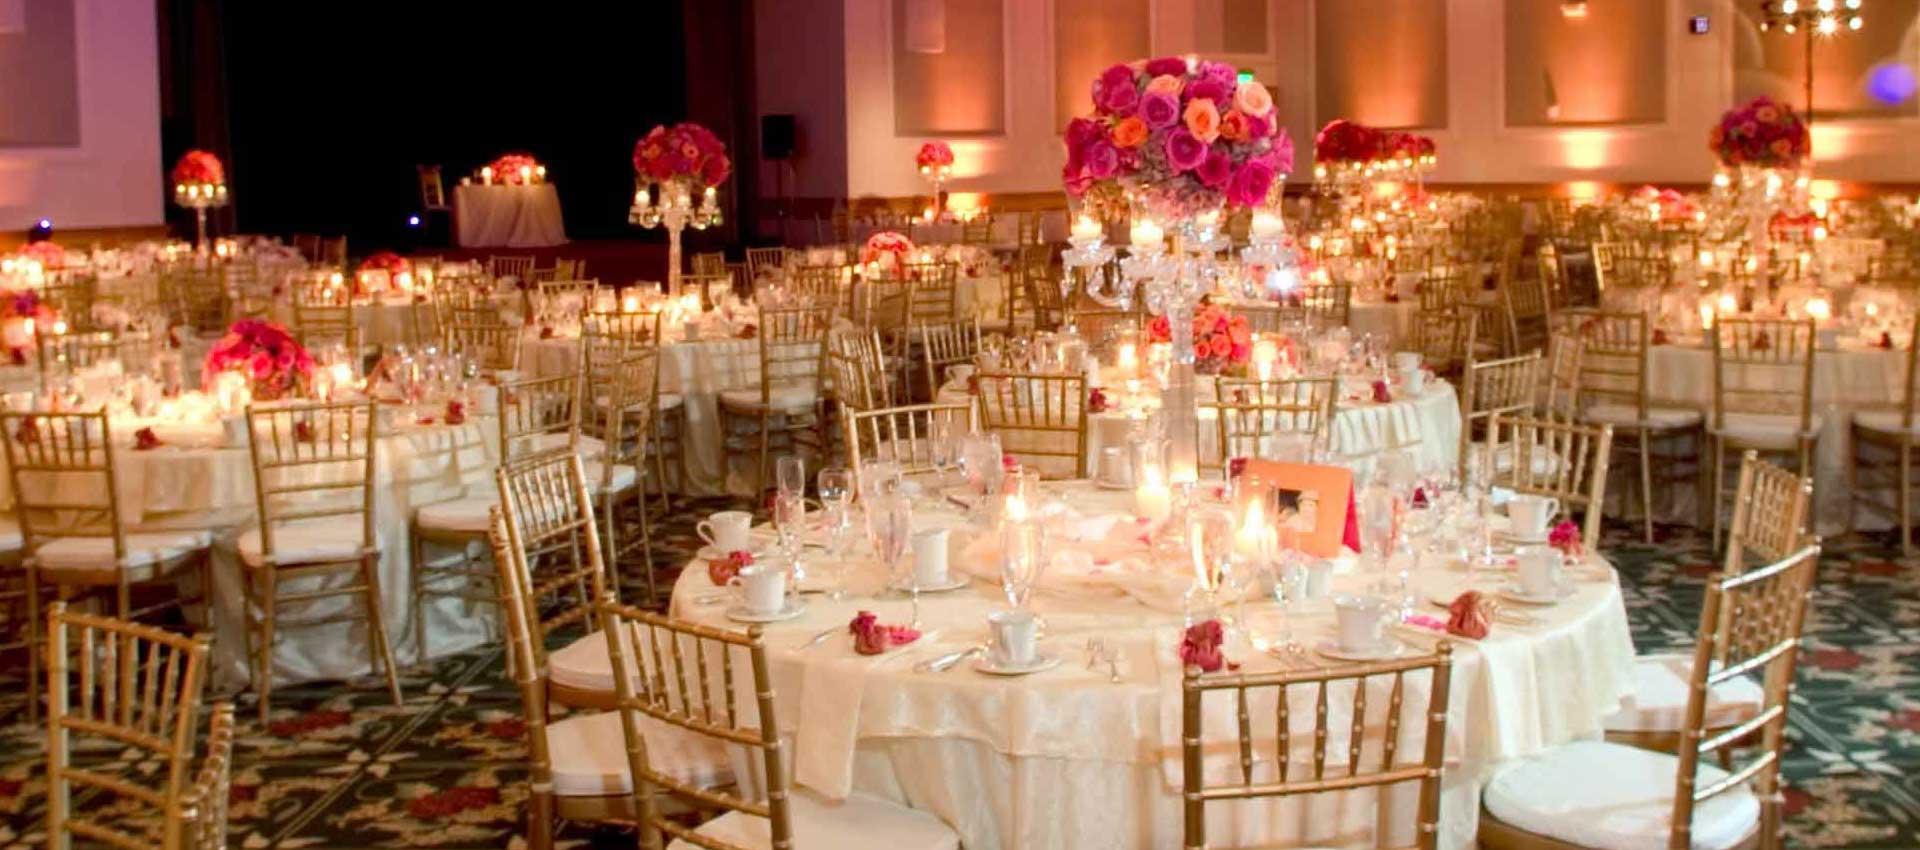 Bawarchi Banquet - Richardson, TX